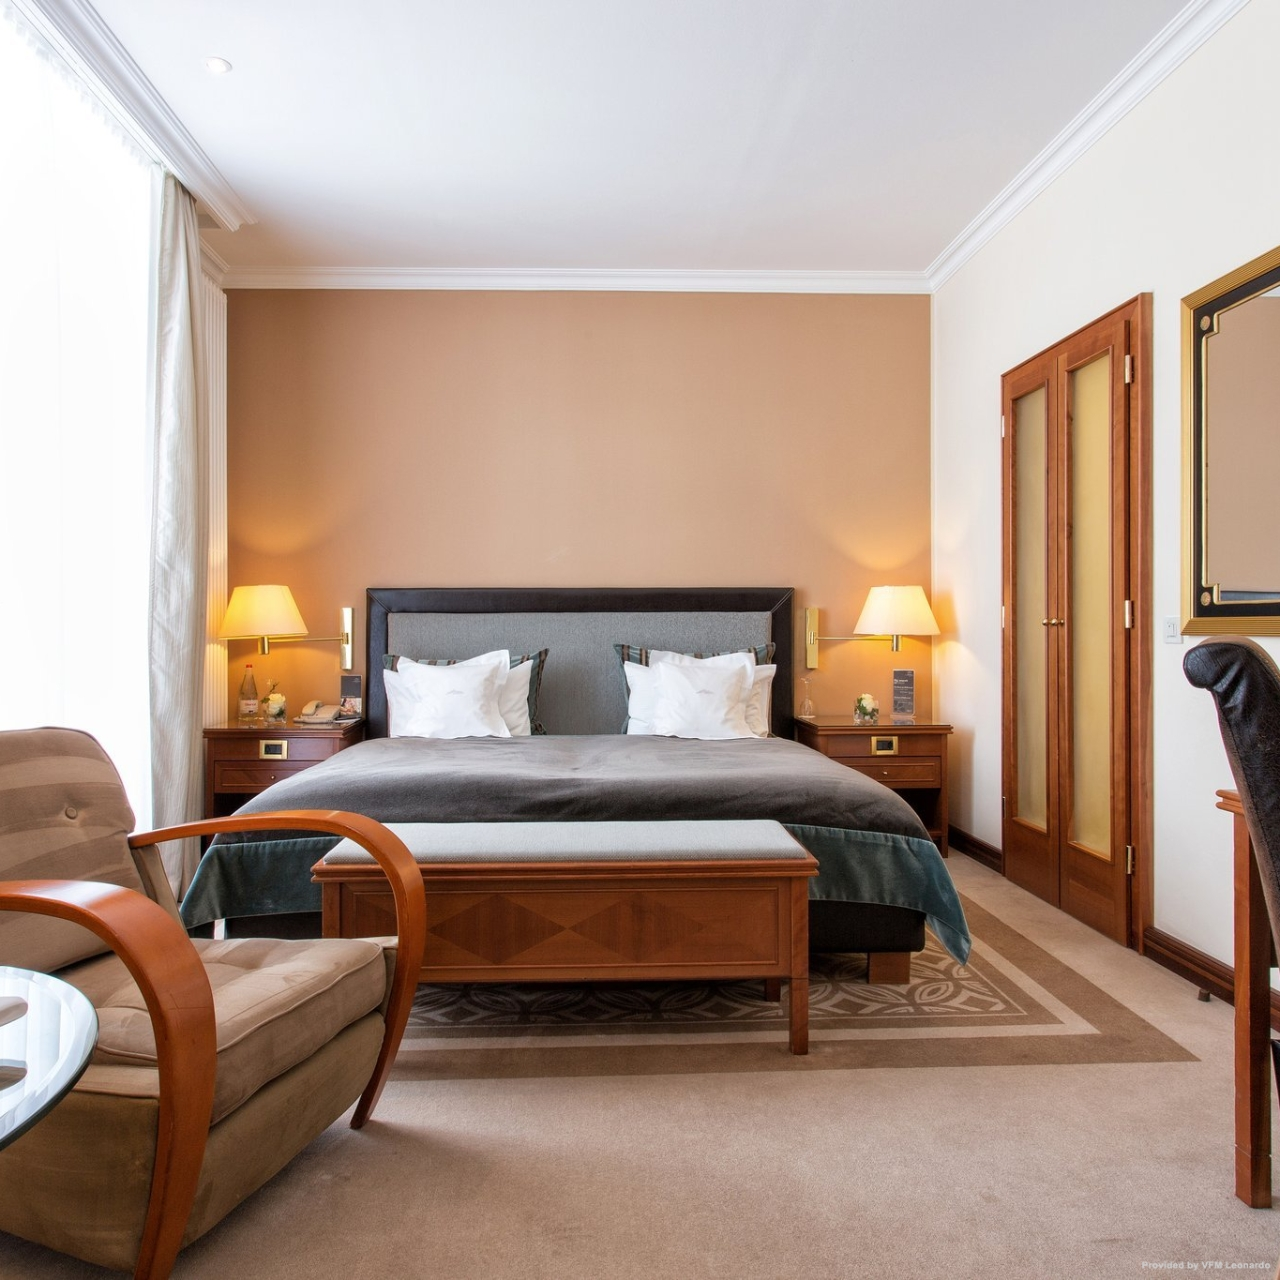 Kempinski Grand Hotel Des Bains Sankt Moritz Graubunden Bei Hrs Mit Gratis Leistungen